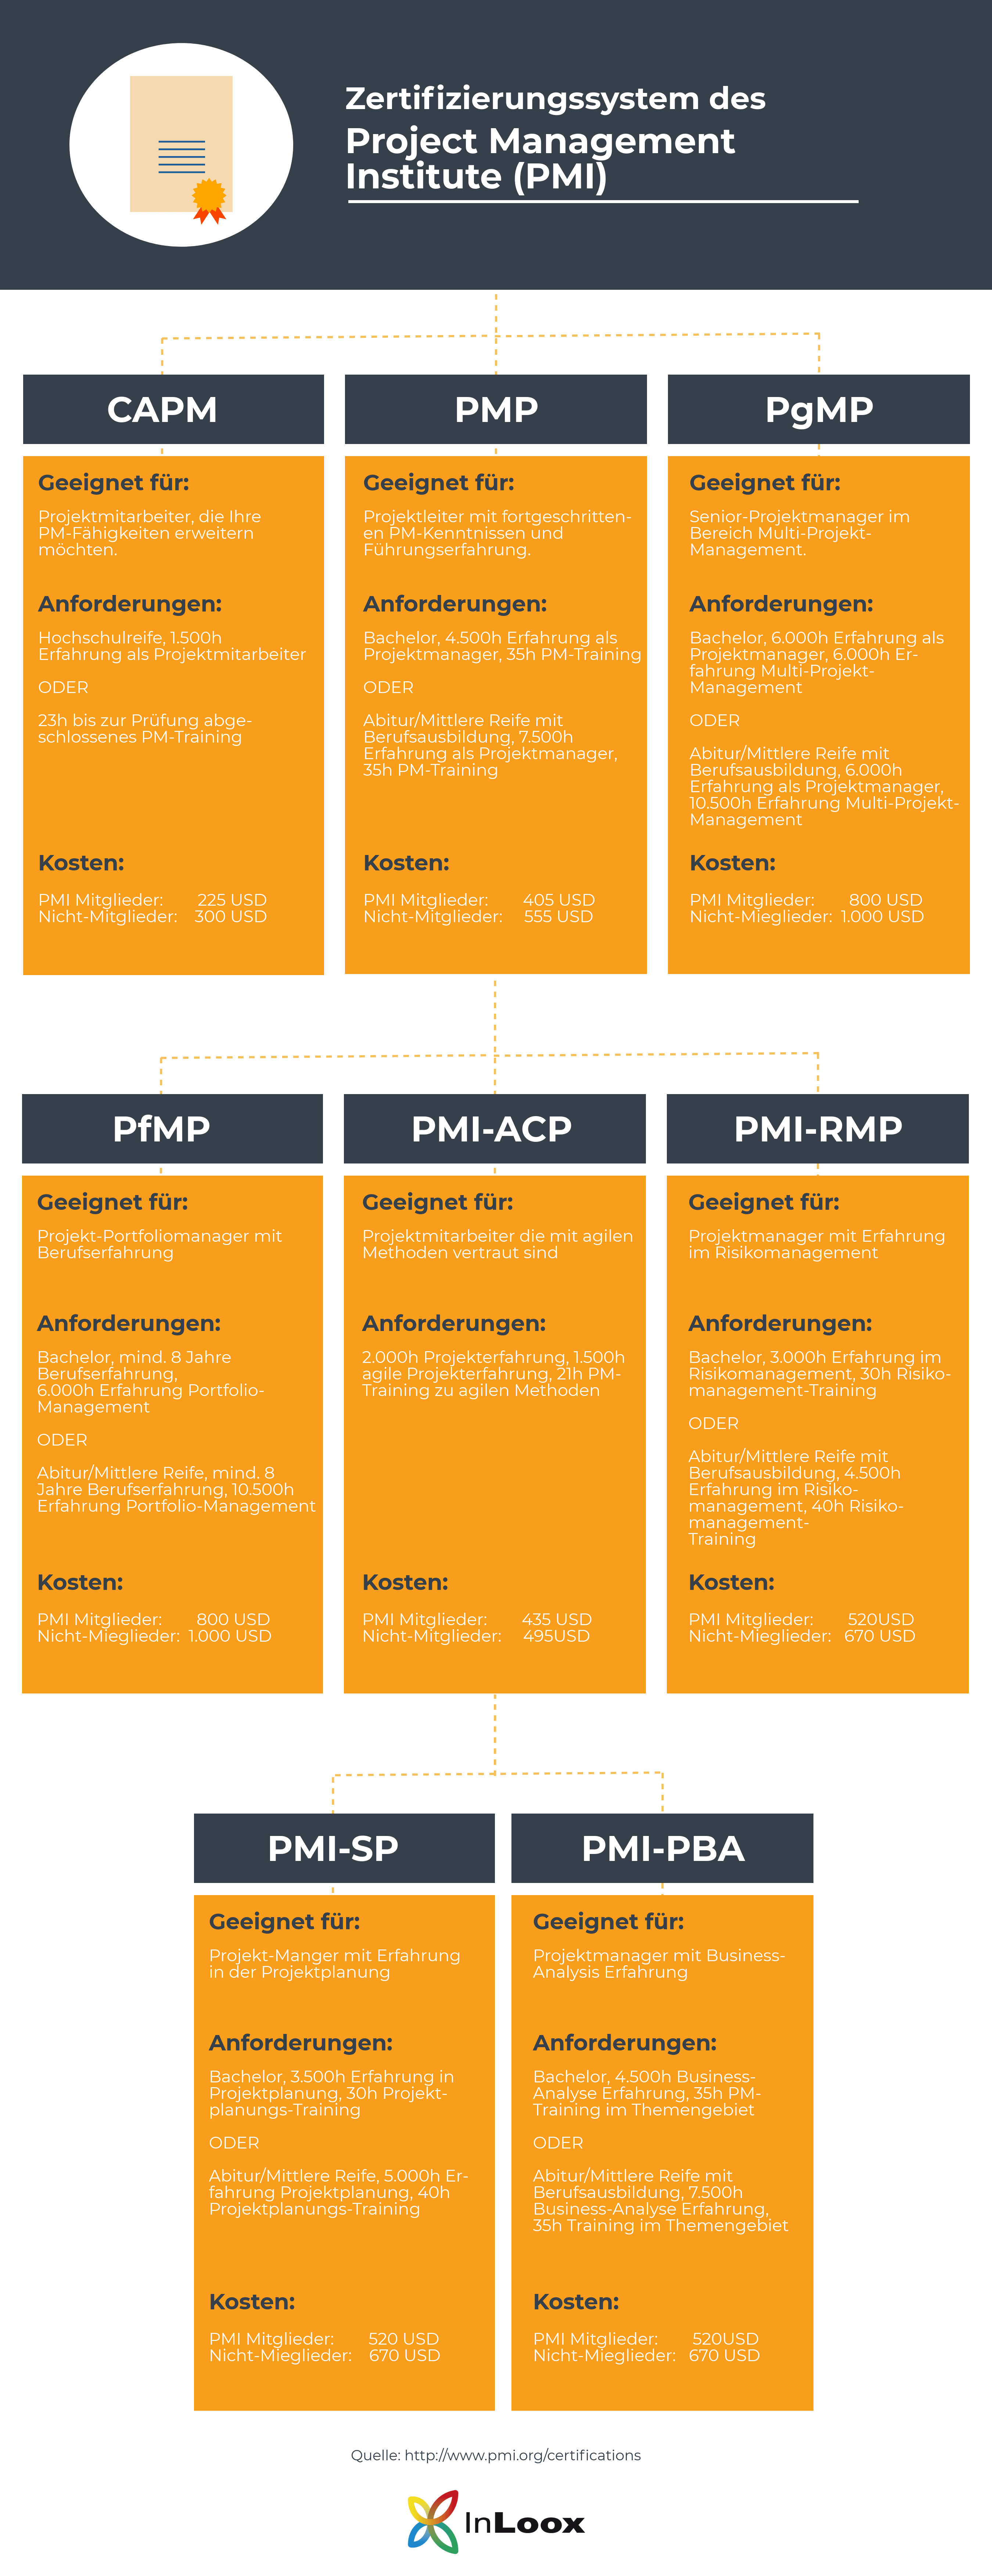 Übersicht über die Projektmanagement Zertifikate des PMI: CAPM®, PMP®, PgMP®, PfMP®, PMI-ACP®, PMI-RMP®, PMI-SP®, PMI-PBA®